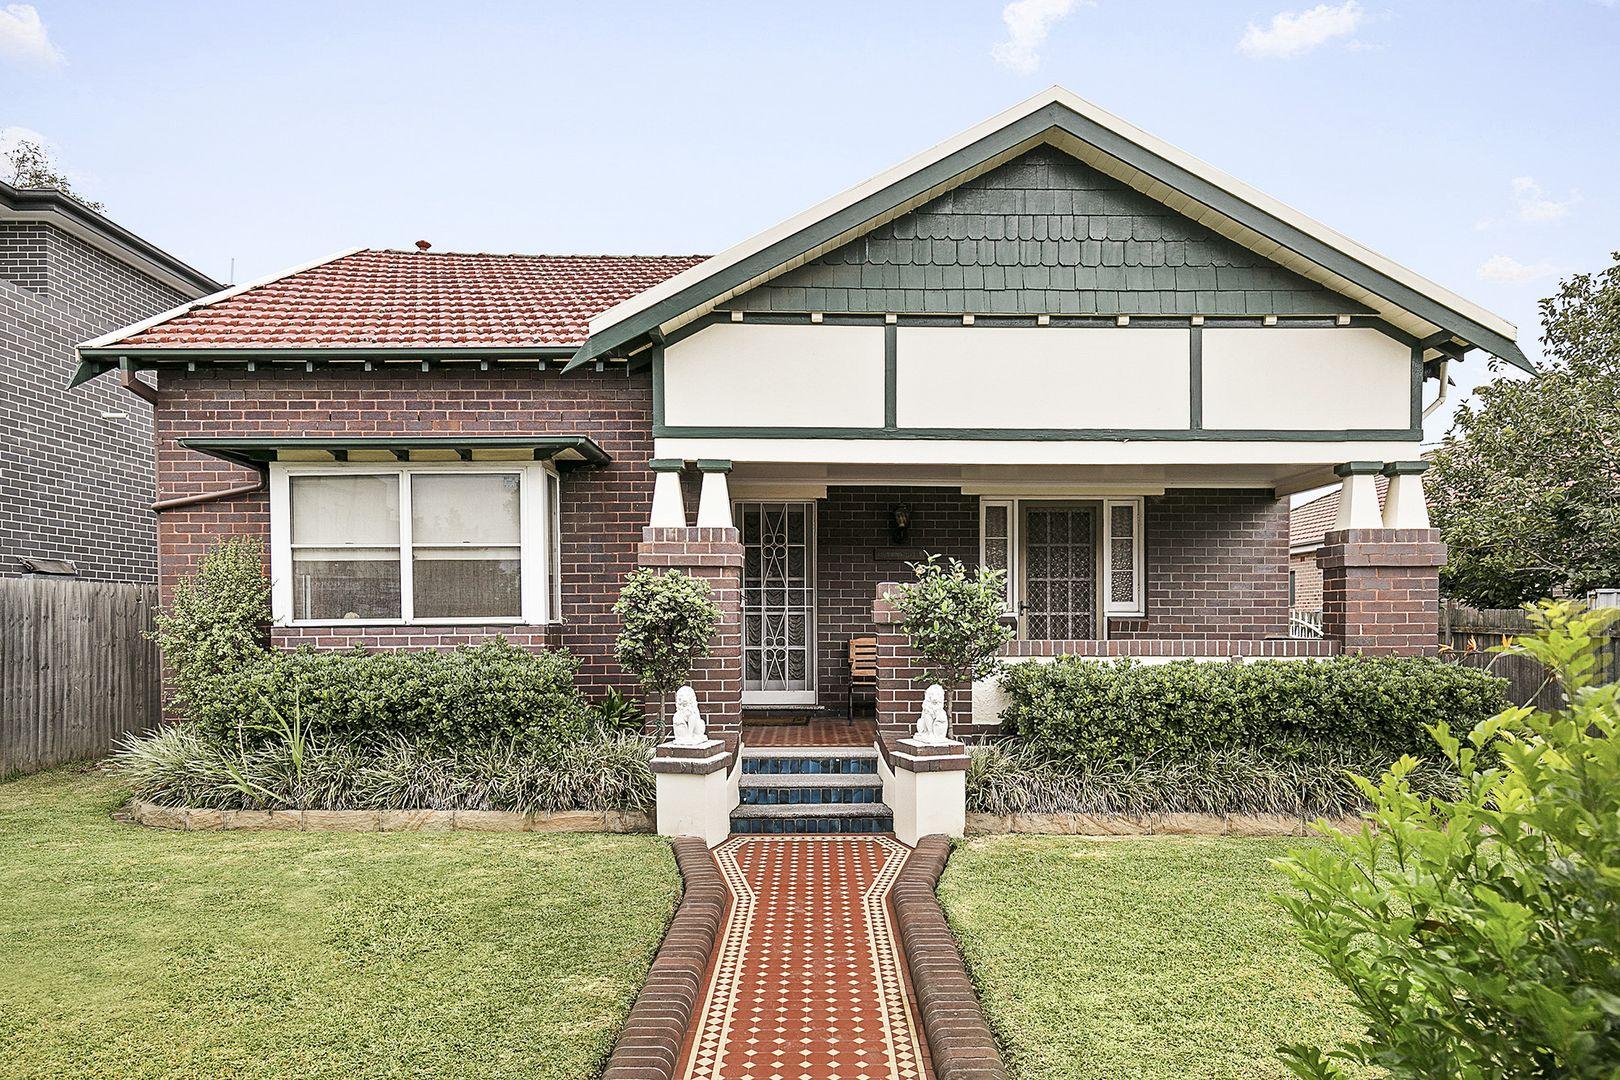 170 Concord  Road, North Strathfield NSW 2137, Image 0